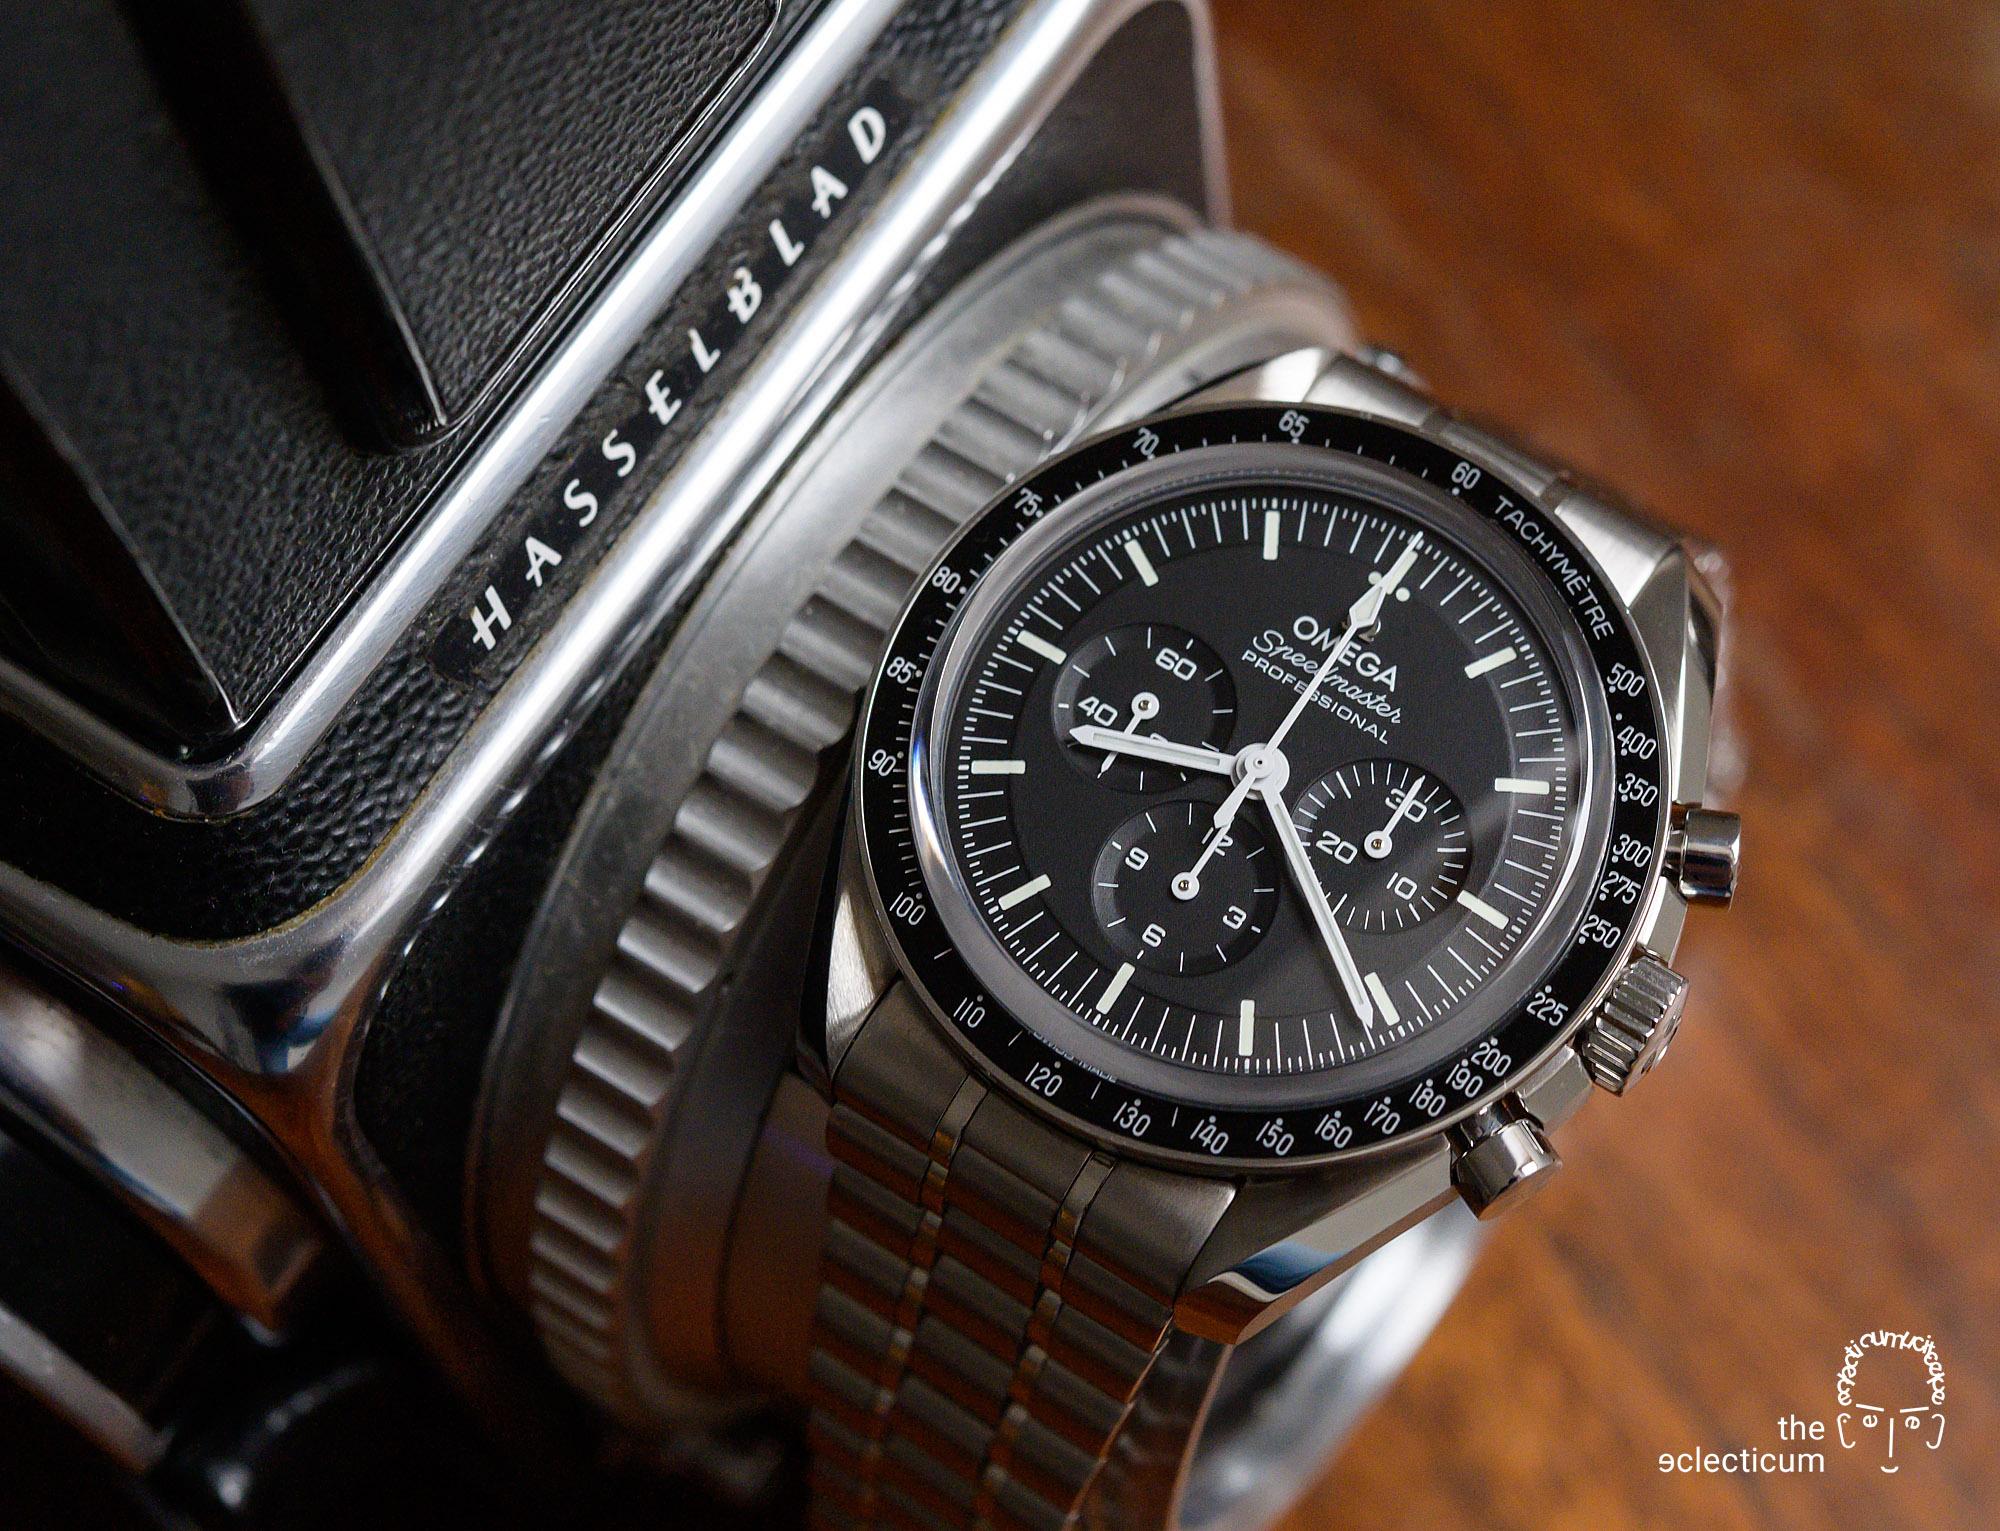 Omega Speedmaster Moonwatch Cal. 3861 Hasselblad